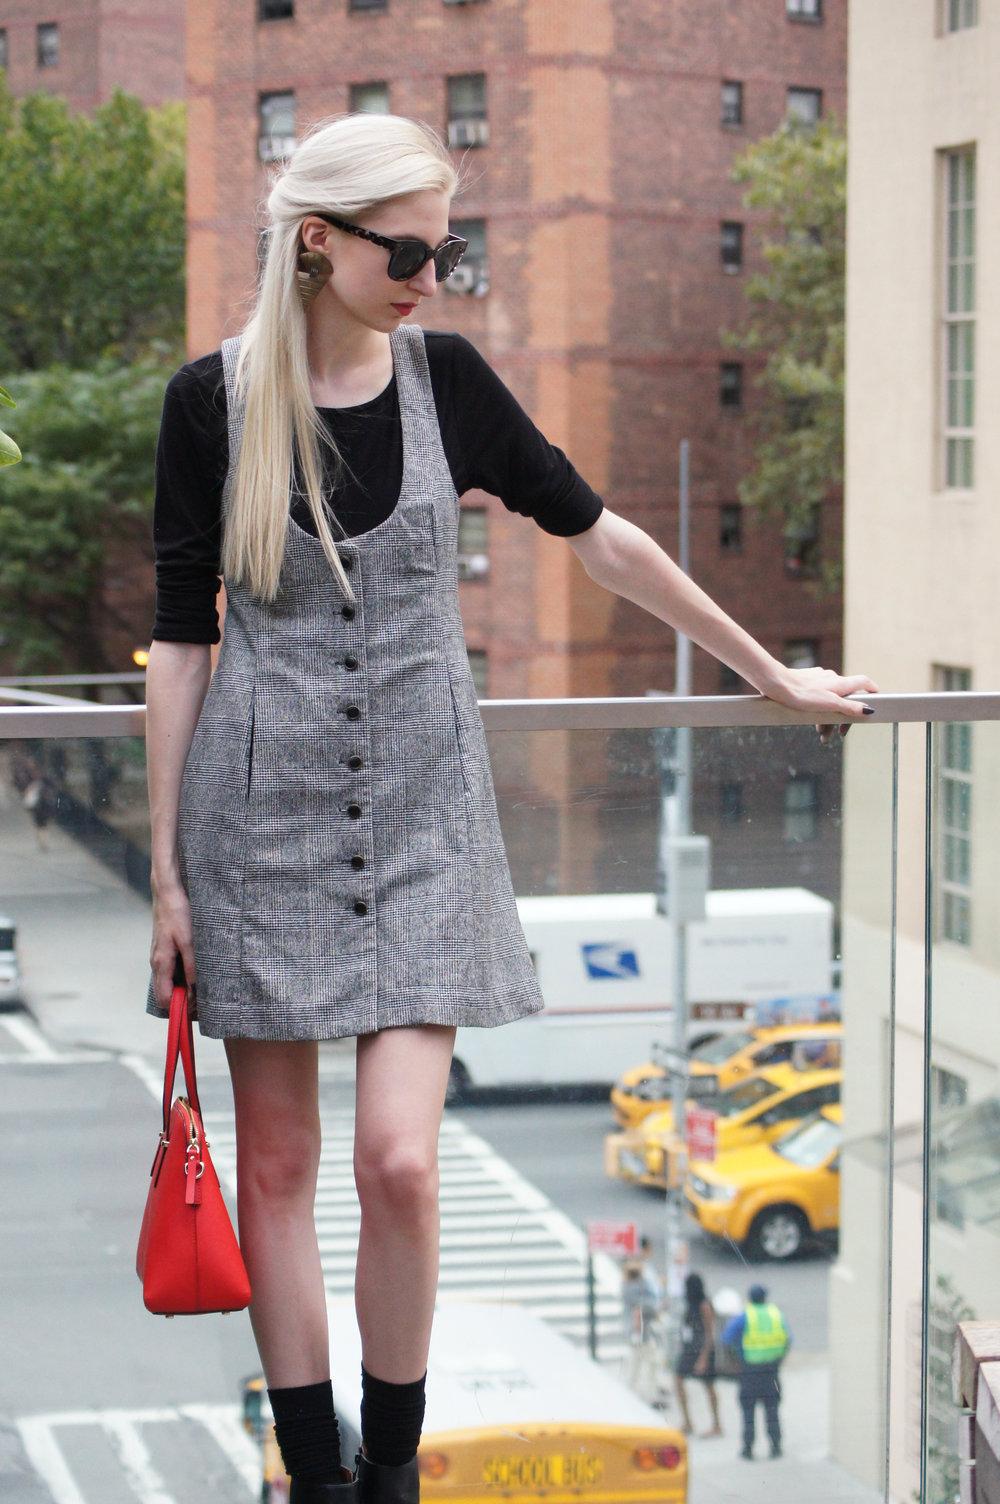 Audra Koch - vintage tibi tweed apron dress, loft black longsleeve, Next black heeled ankle boots, kate spade cedar street maise, vintage earrings, loft audrey hepburn sunglasses - Highline Park New York City